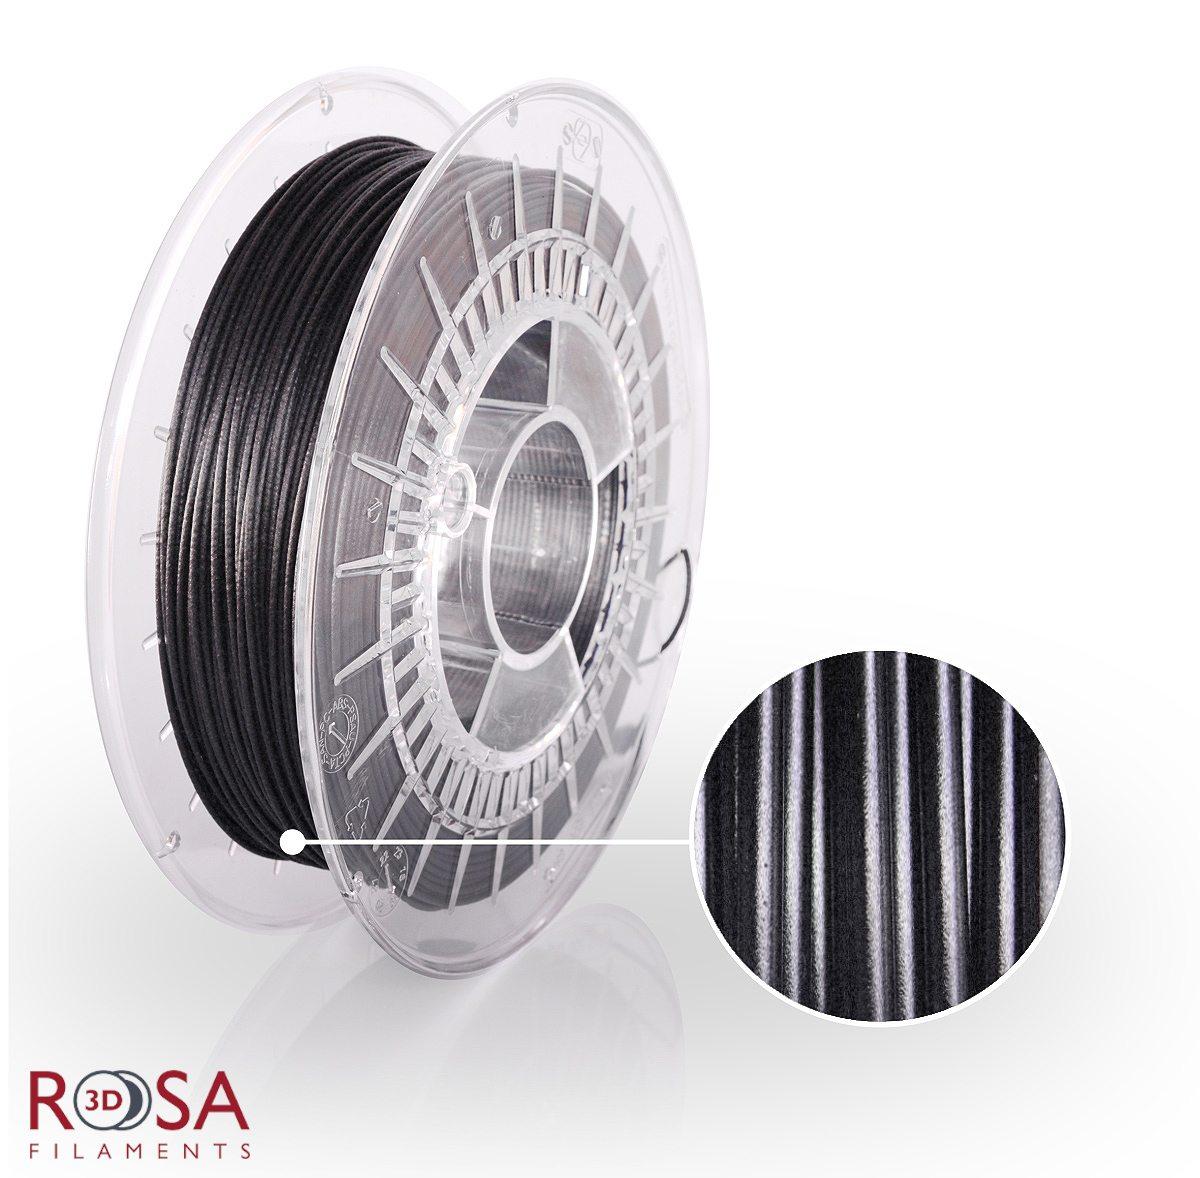 szpula filamentu PLA CarbonLook o wadze 0,5 kg produkcji ROSA3D